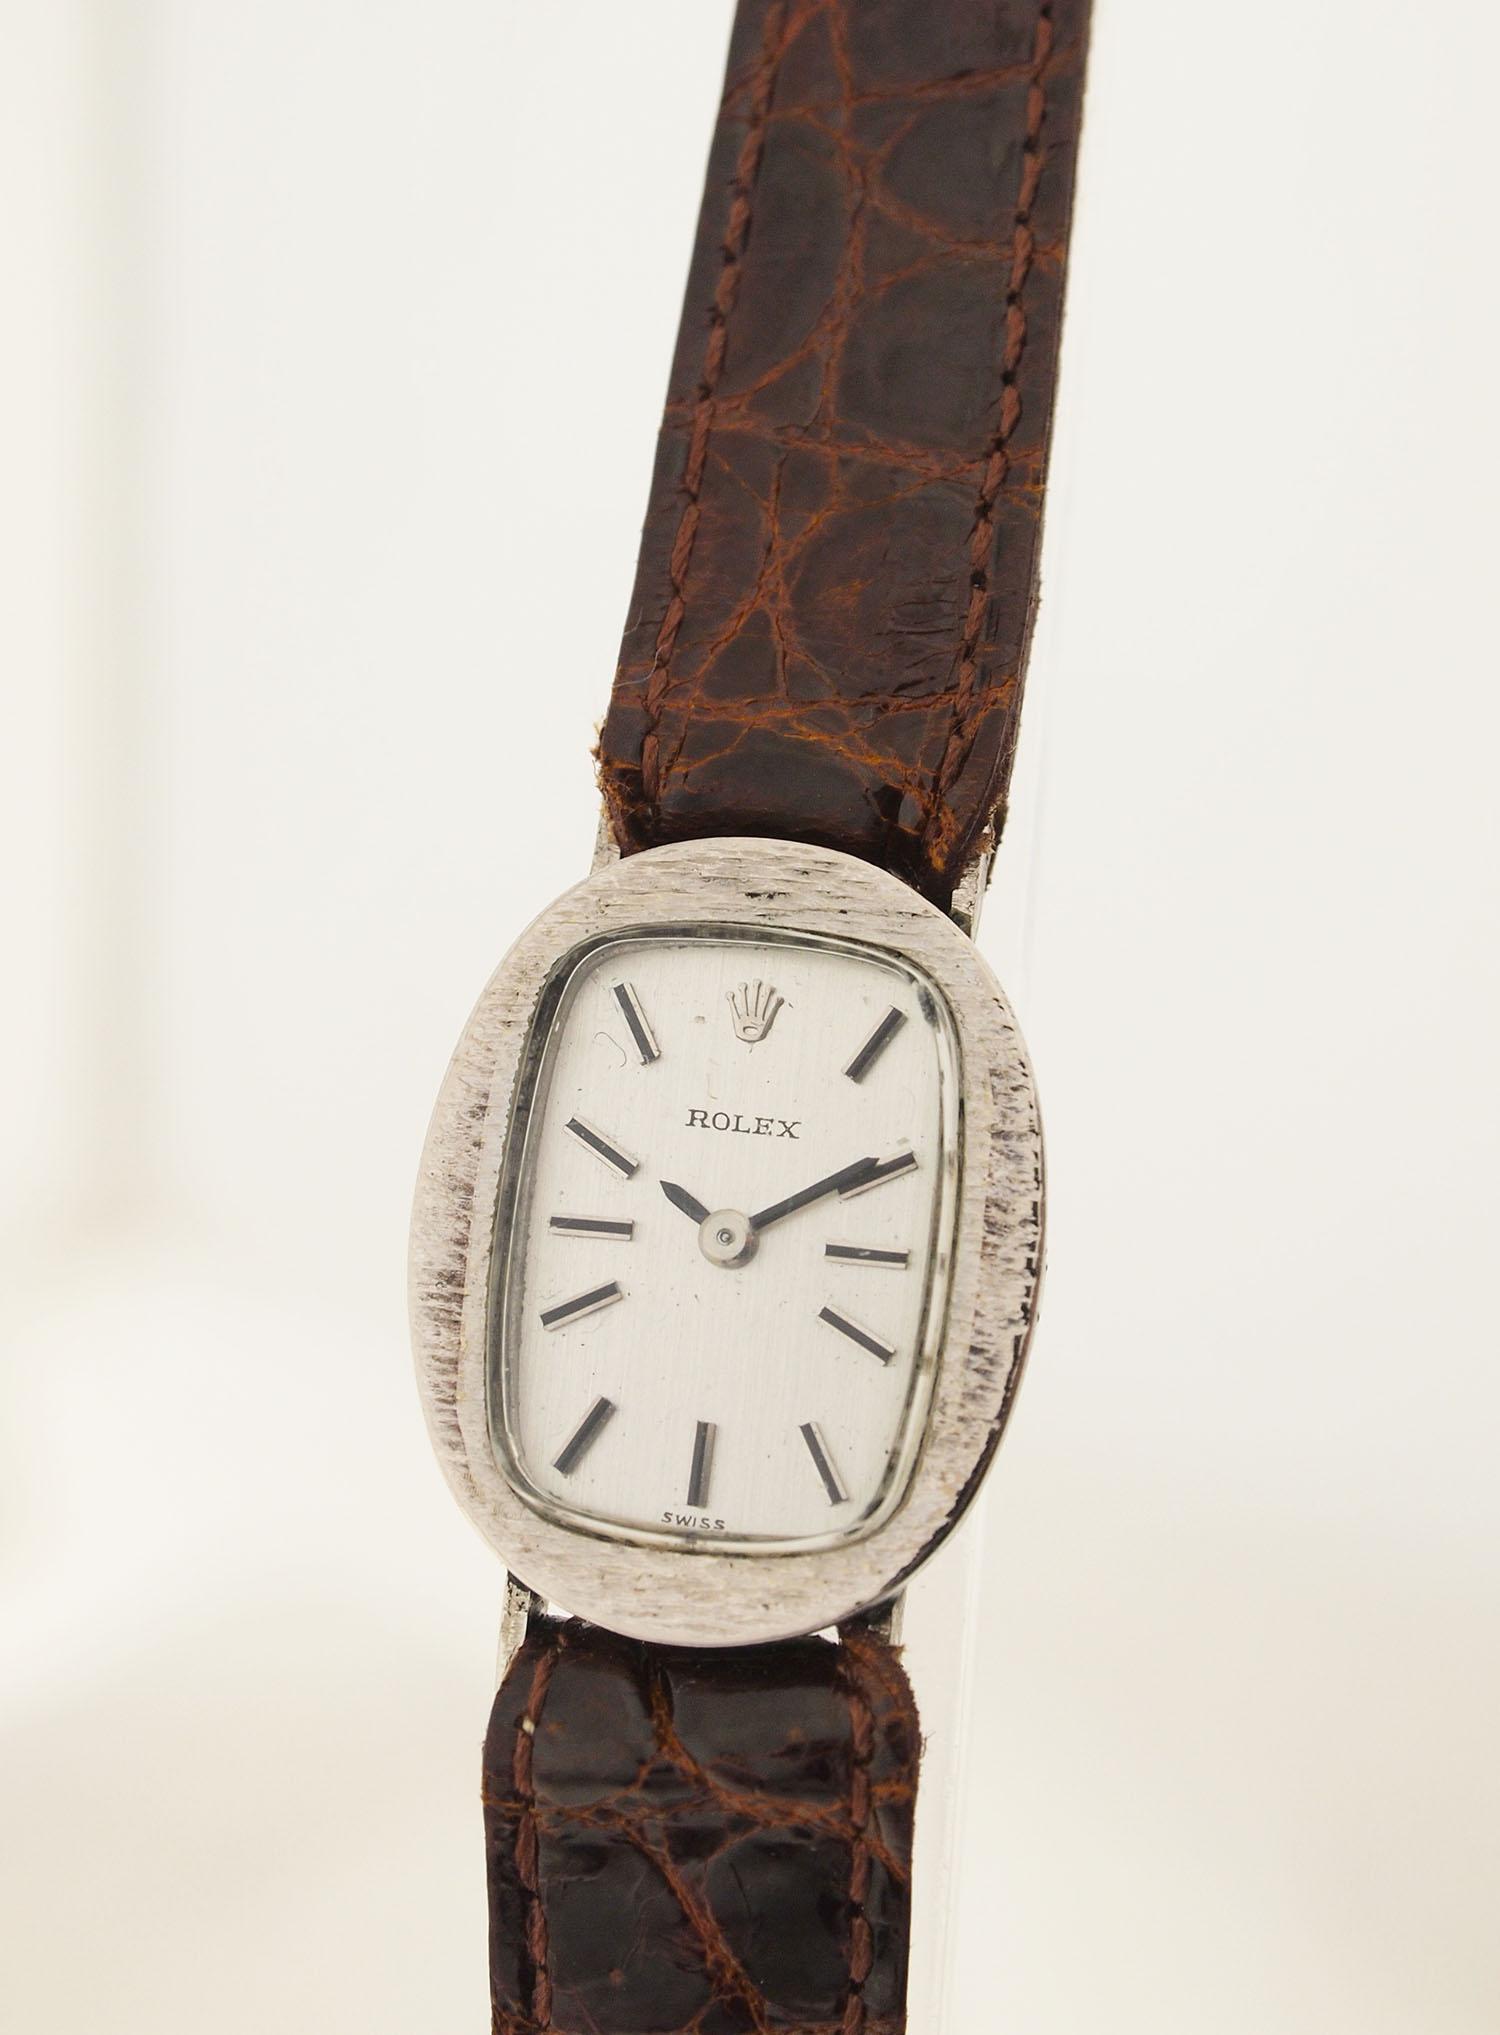 rolex damen armbanduhr in 18ct weissgold 1960er jahre. Black Bedroom Furniture Sets. Home Design Ideas